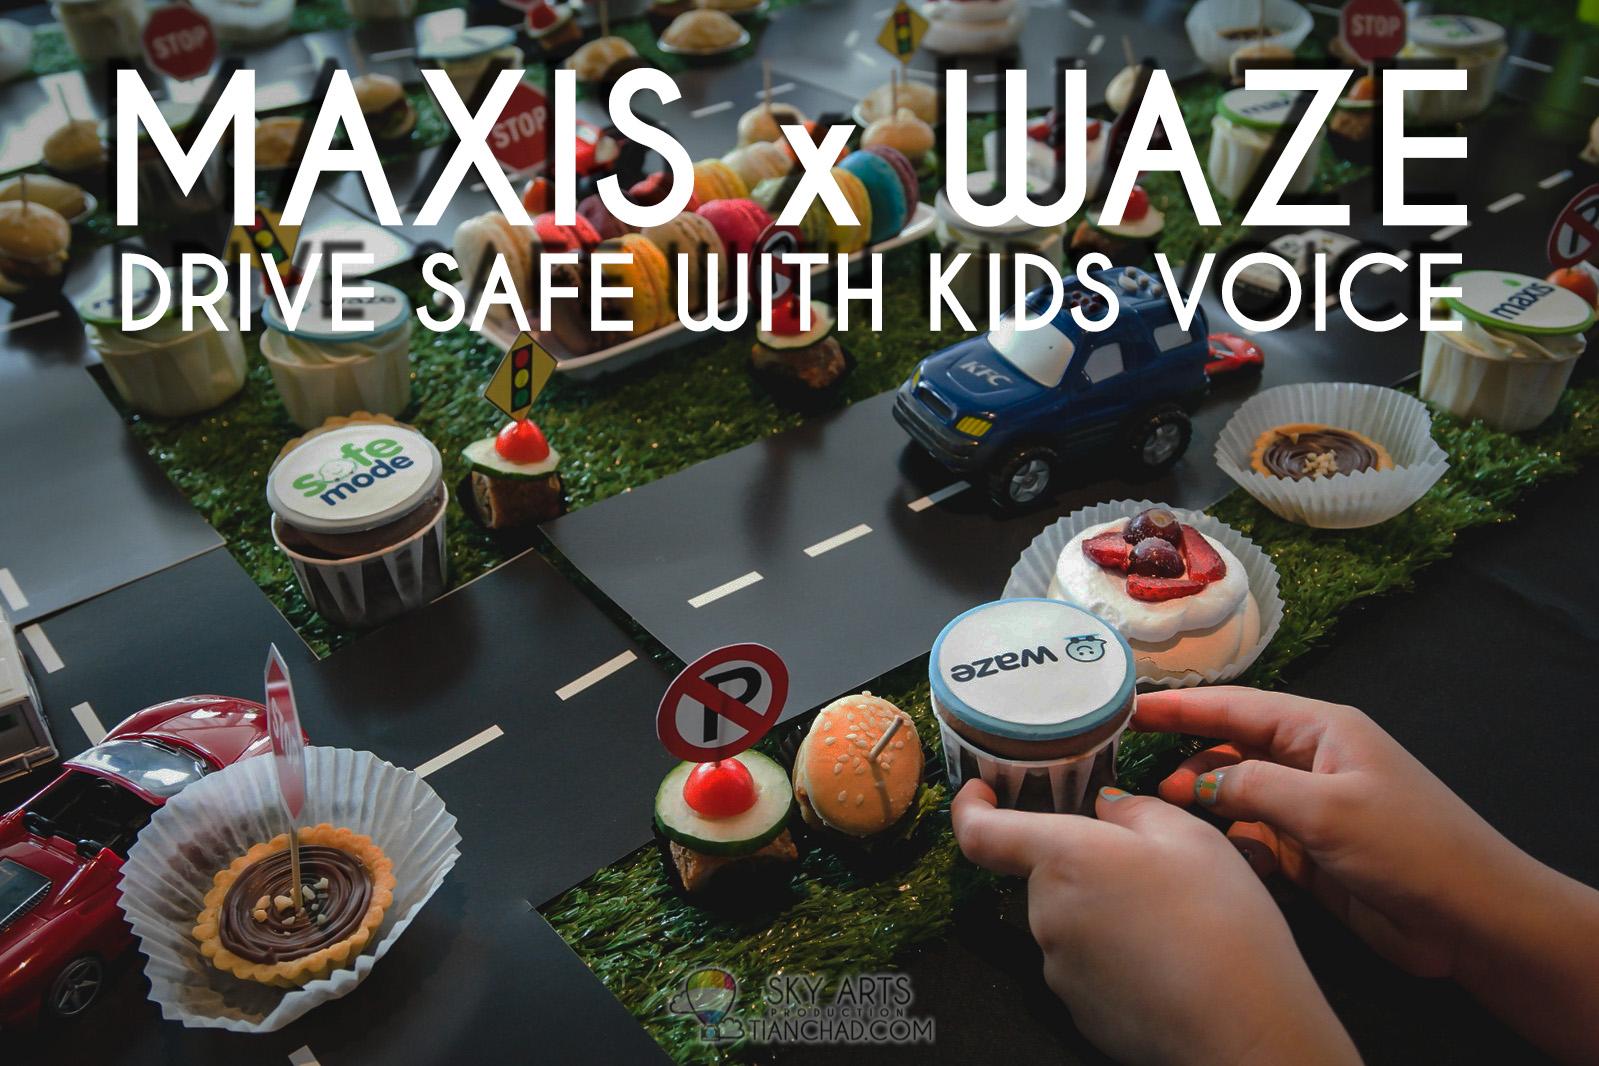 Maxis x Waze: Drive Safe With Kids Voice